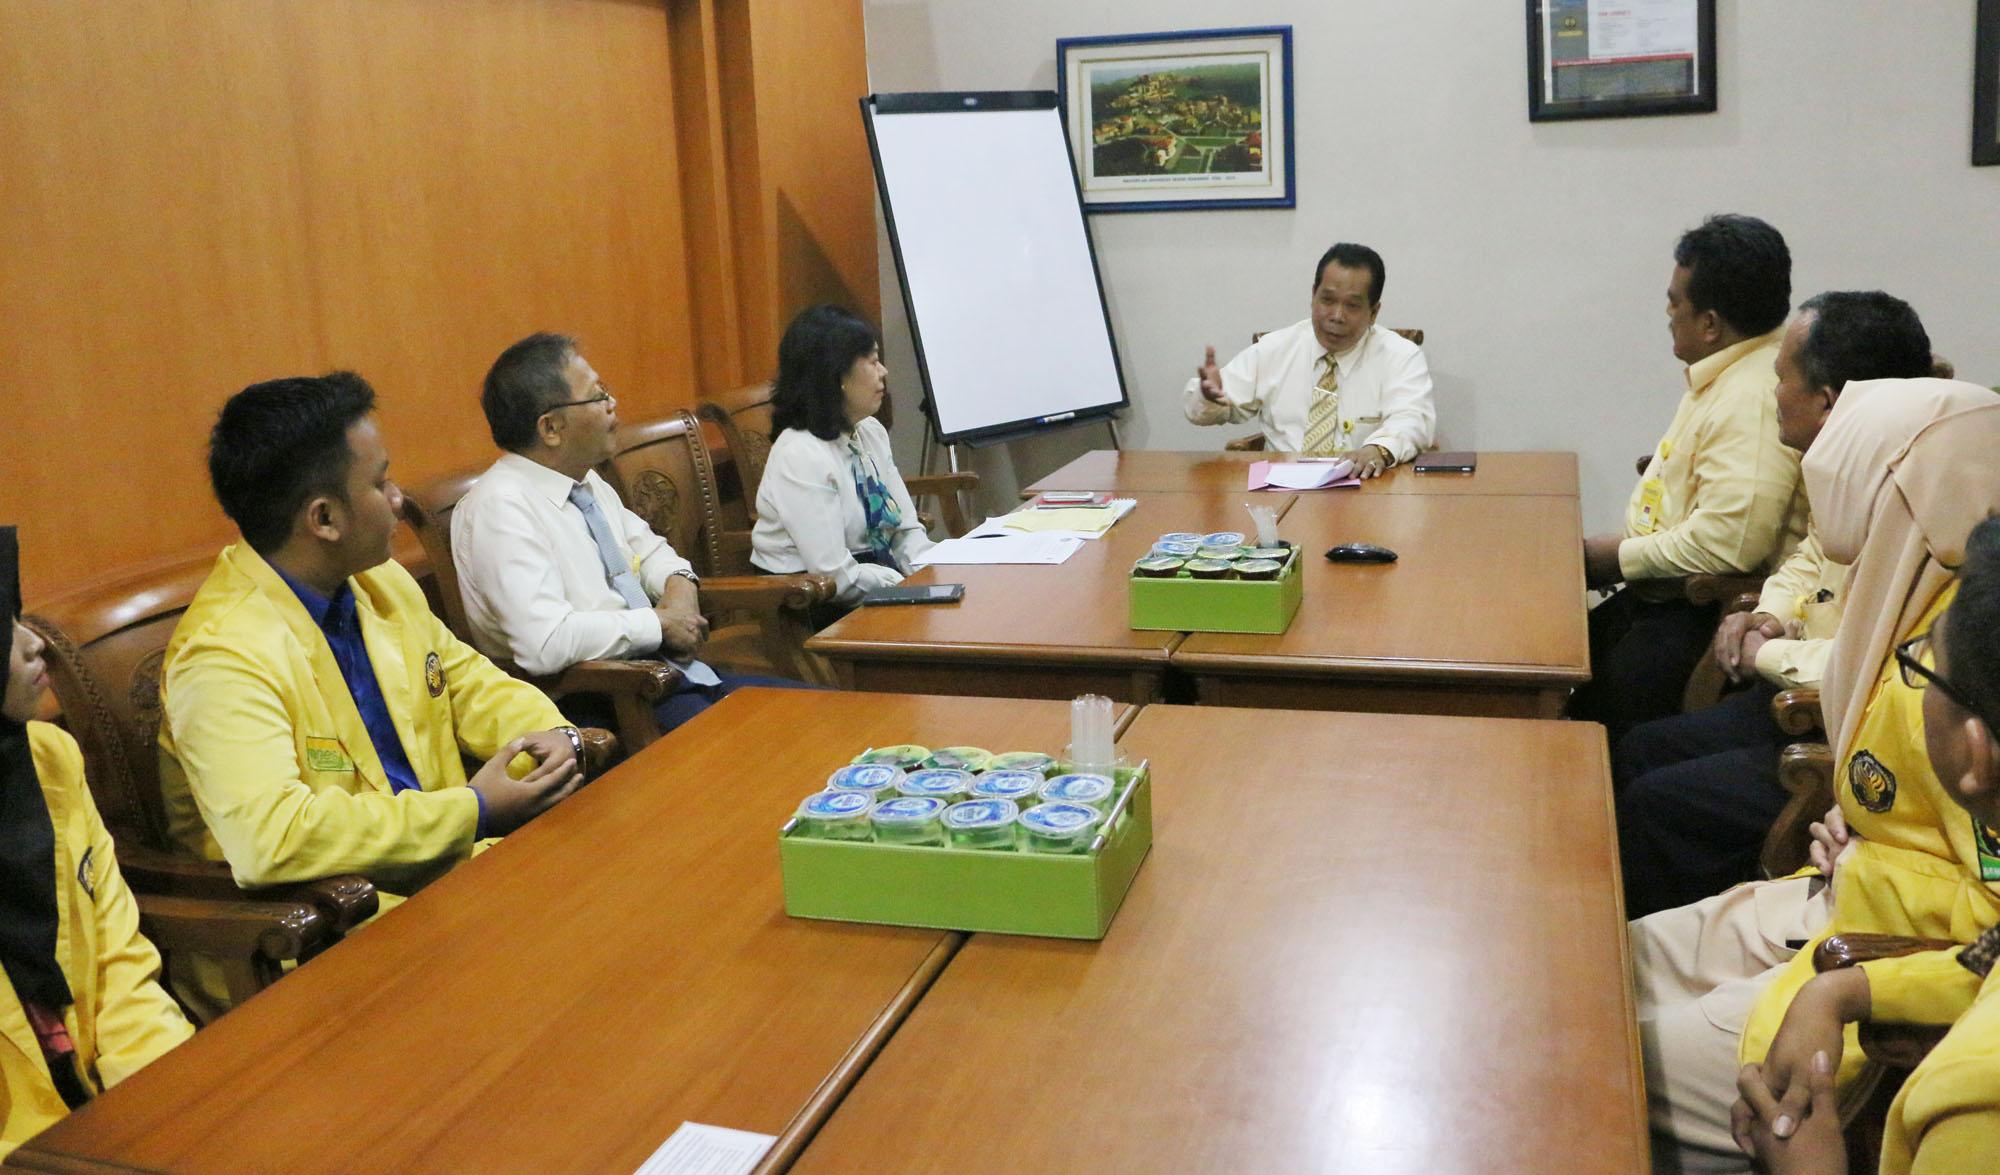 5 Mahasiswa Unnes ikuti KKN Kebangsaan di Kepulauan Riau